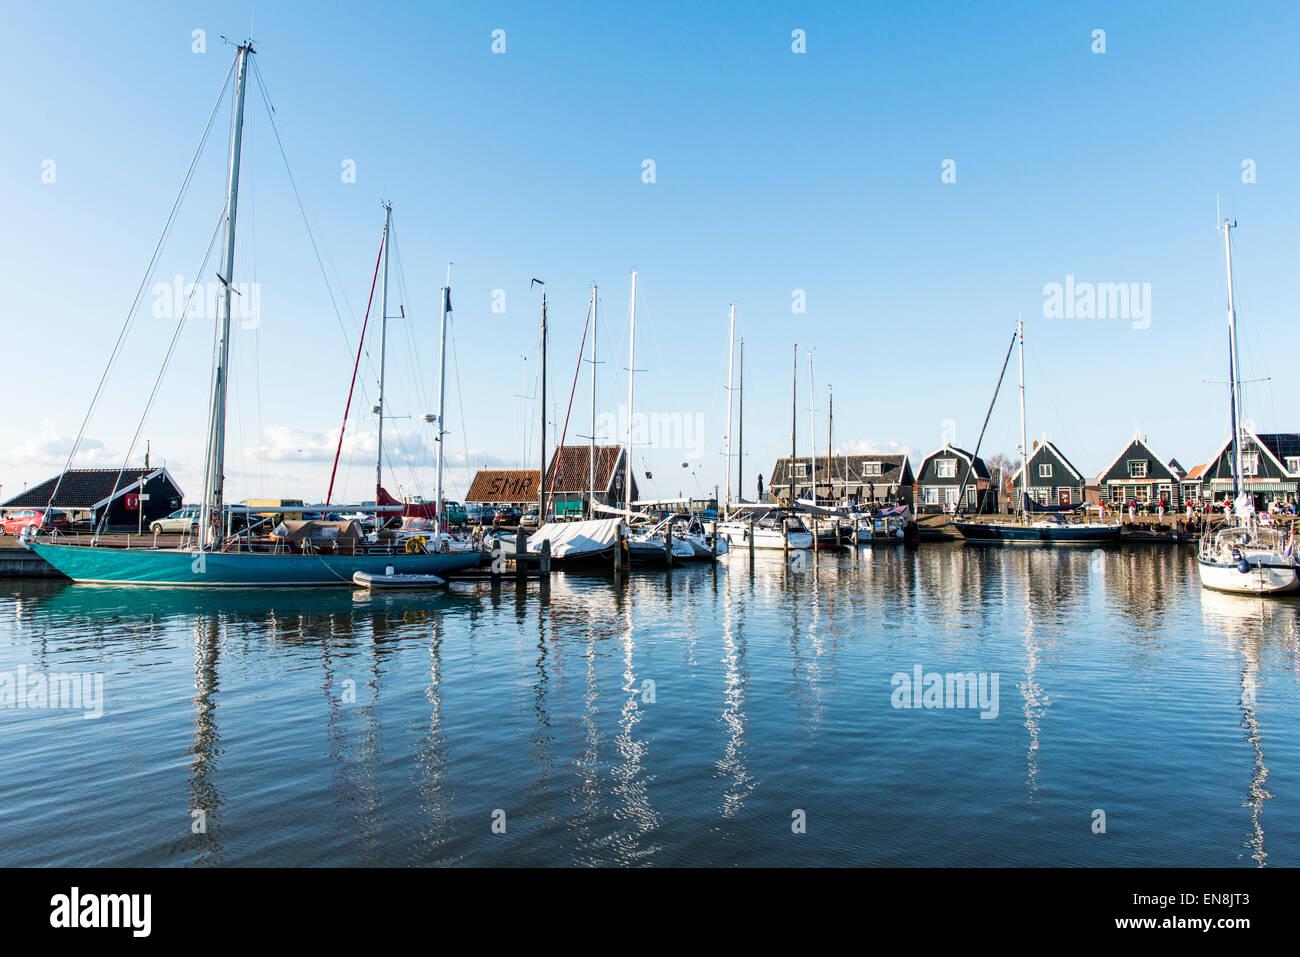 Marken harbour on the Markermeer, in the Netherlands - Stock Image